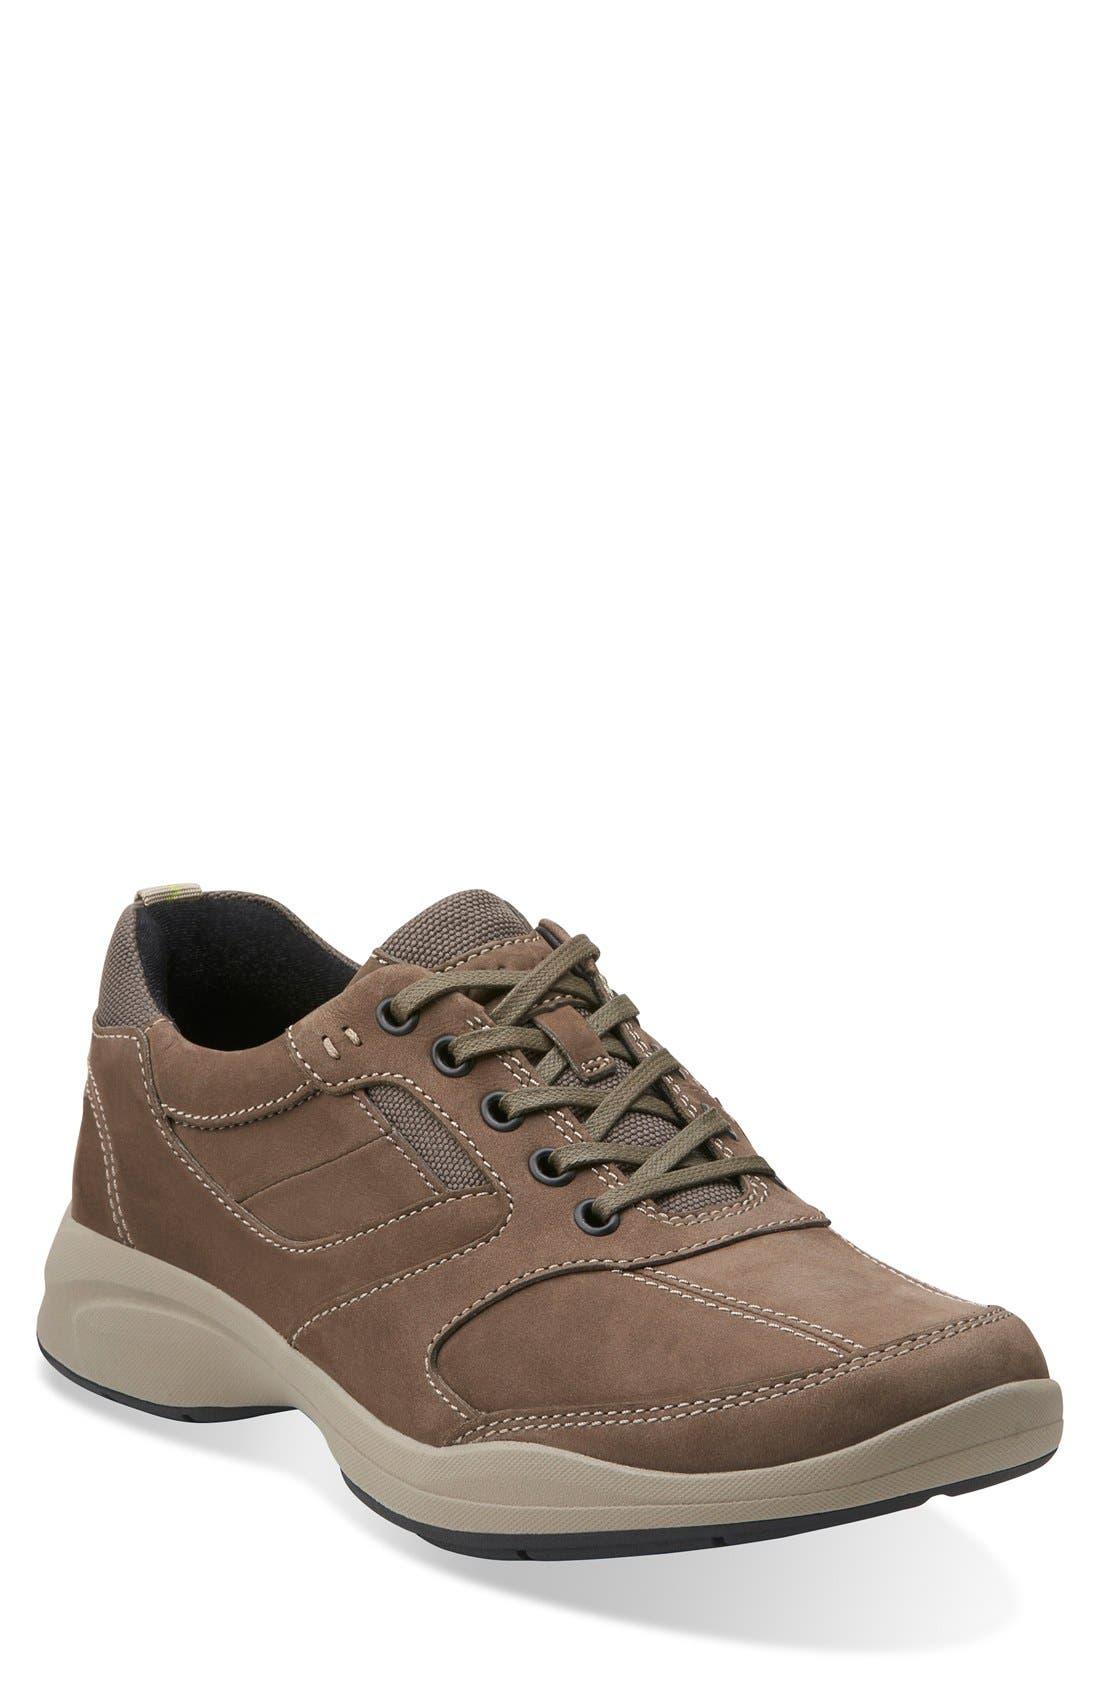 Clarks®'WavekoreyFly' Sneaker (Men)